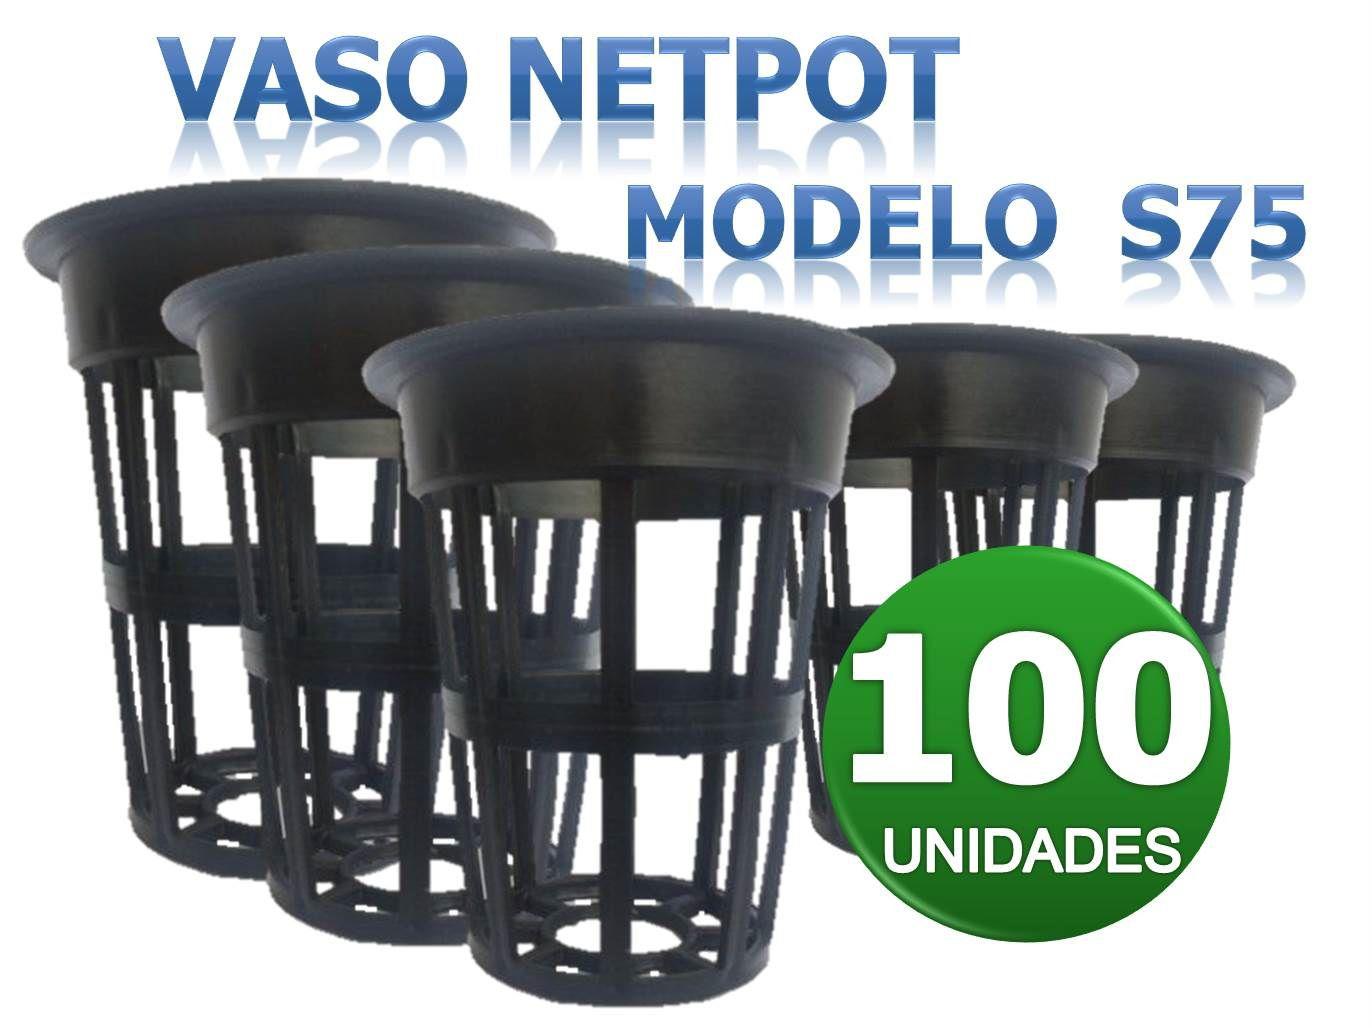 VASO NETPOT S75 - 100 UNIDADES